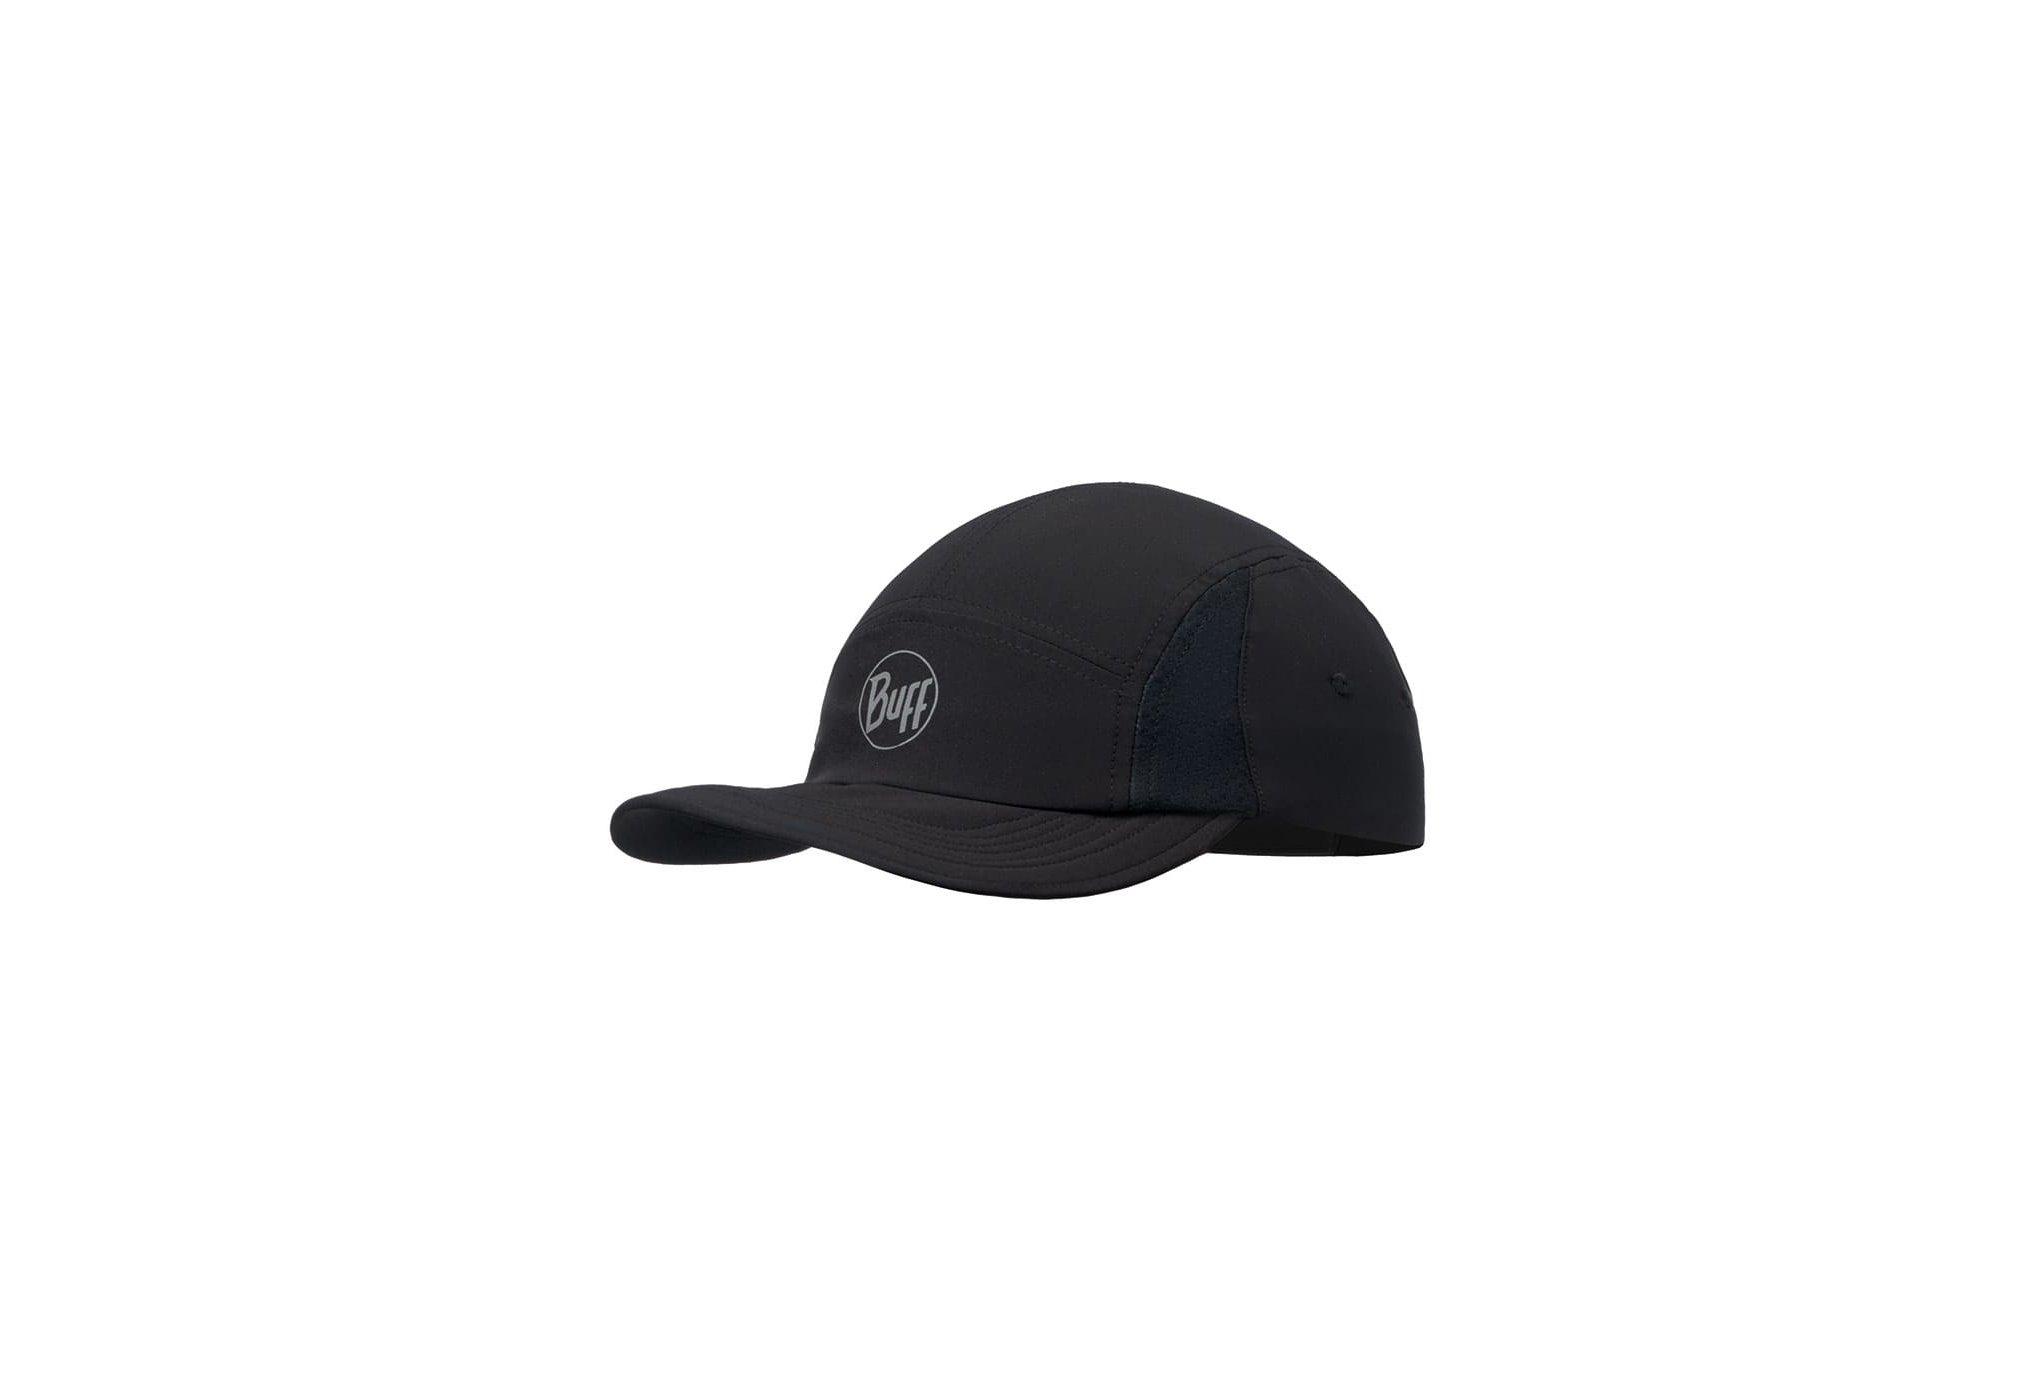 Buff Run Cap R-Solid Black Casquettes / bandeaux